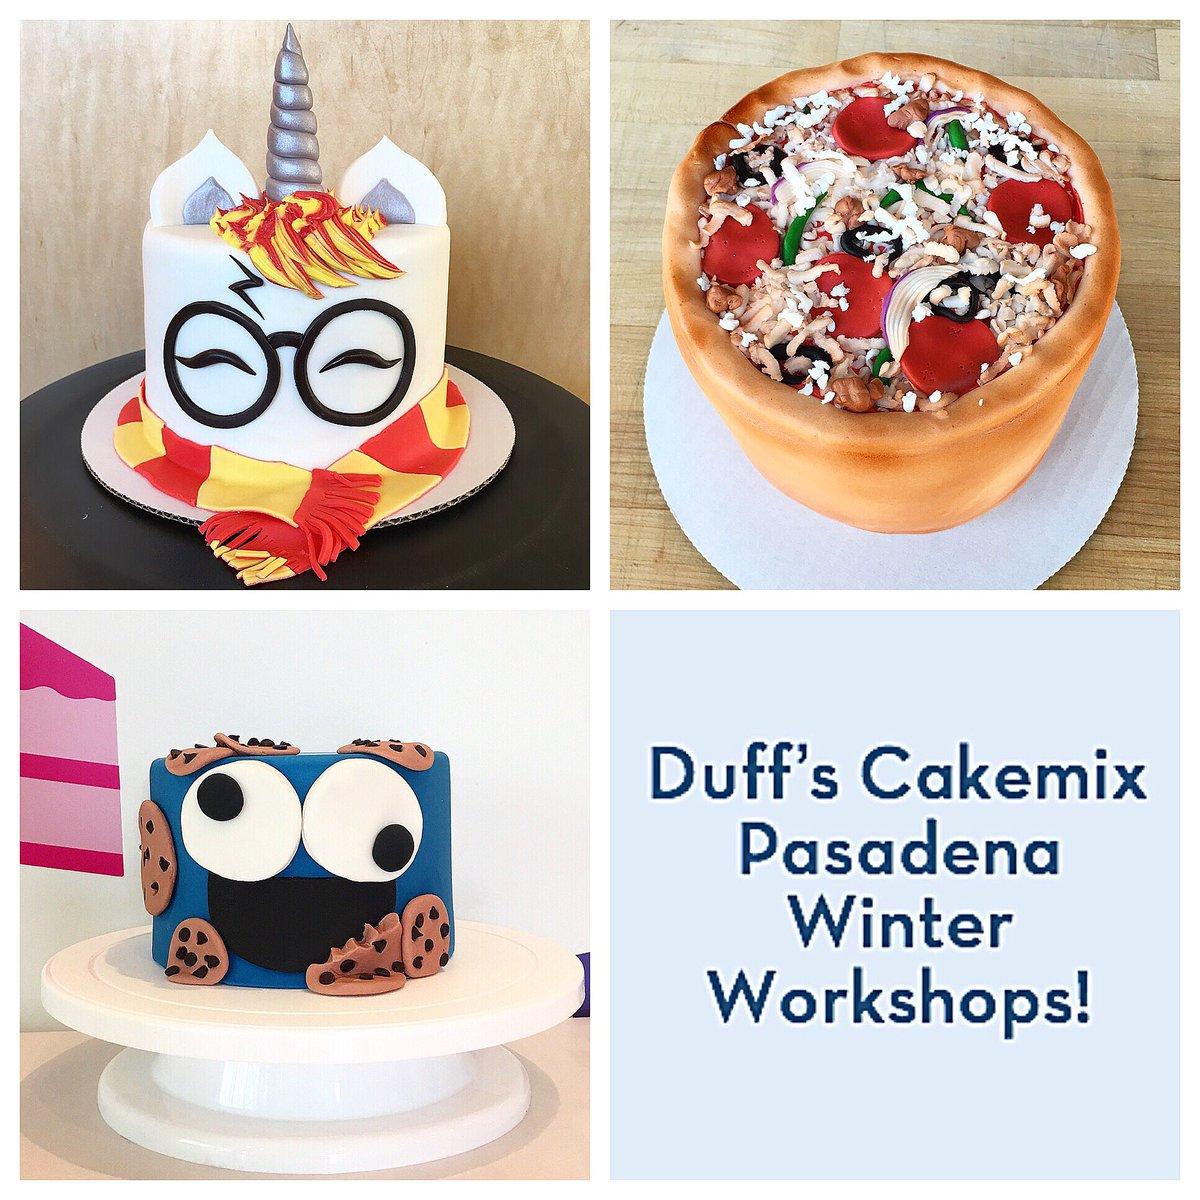 Duff S Cakemix On Twitter Winter Workshops Start Tomorrow